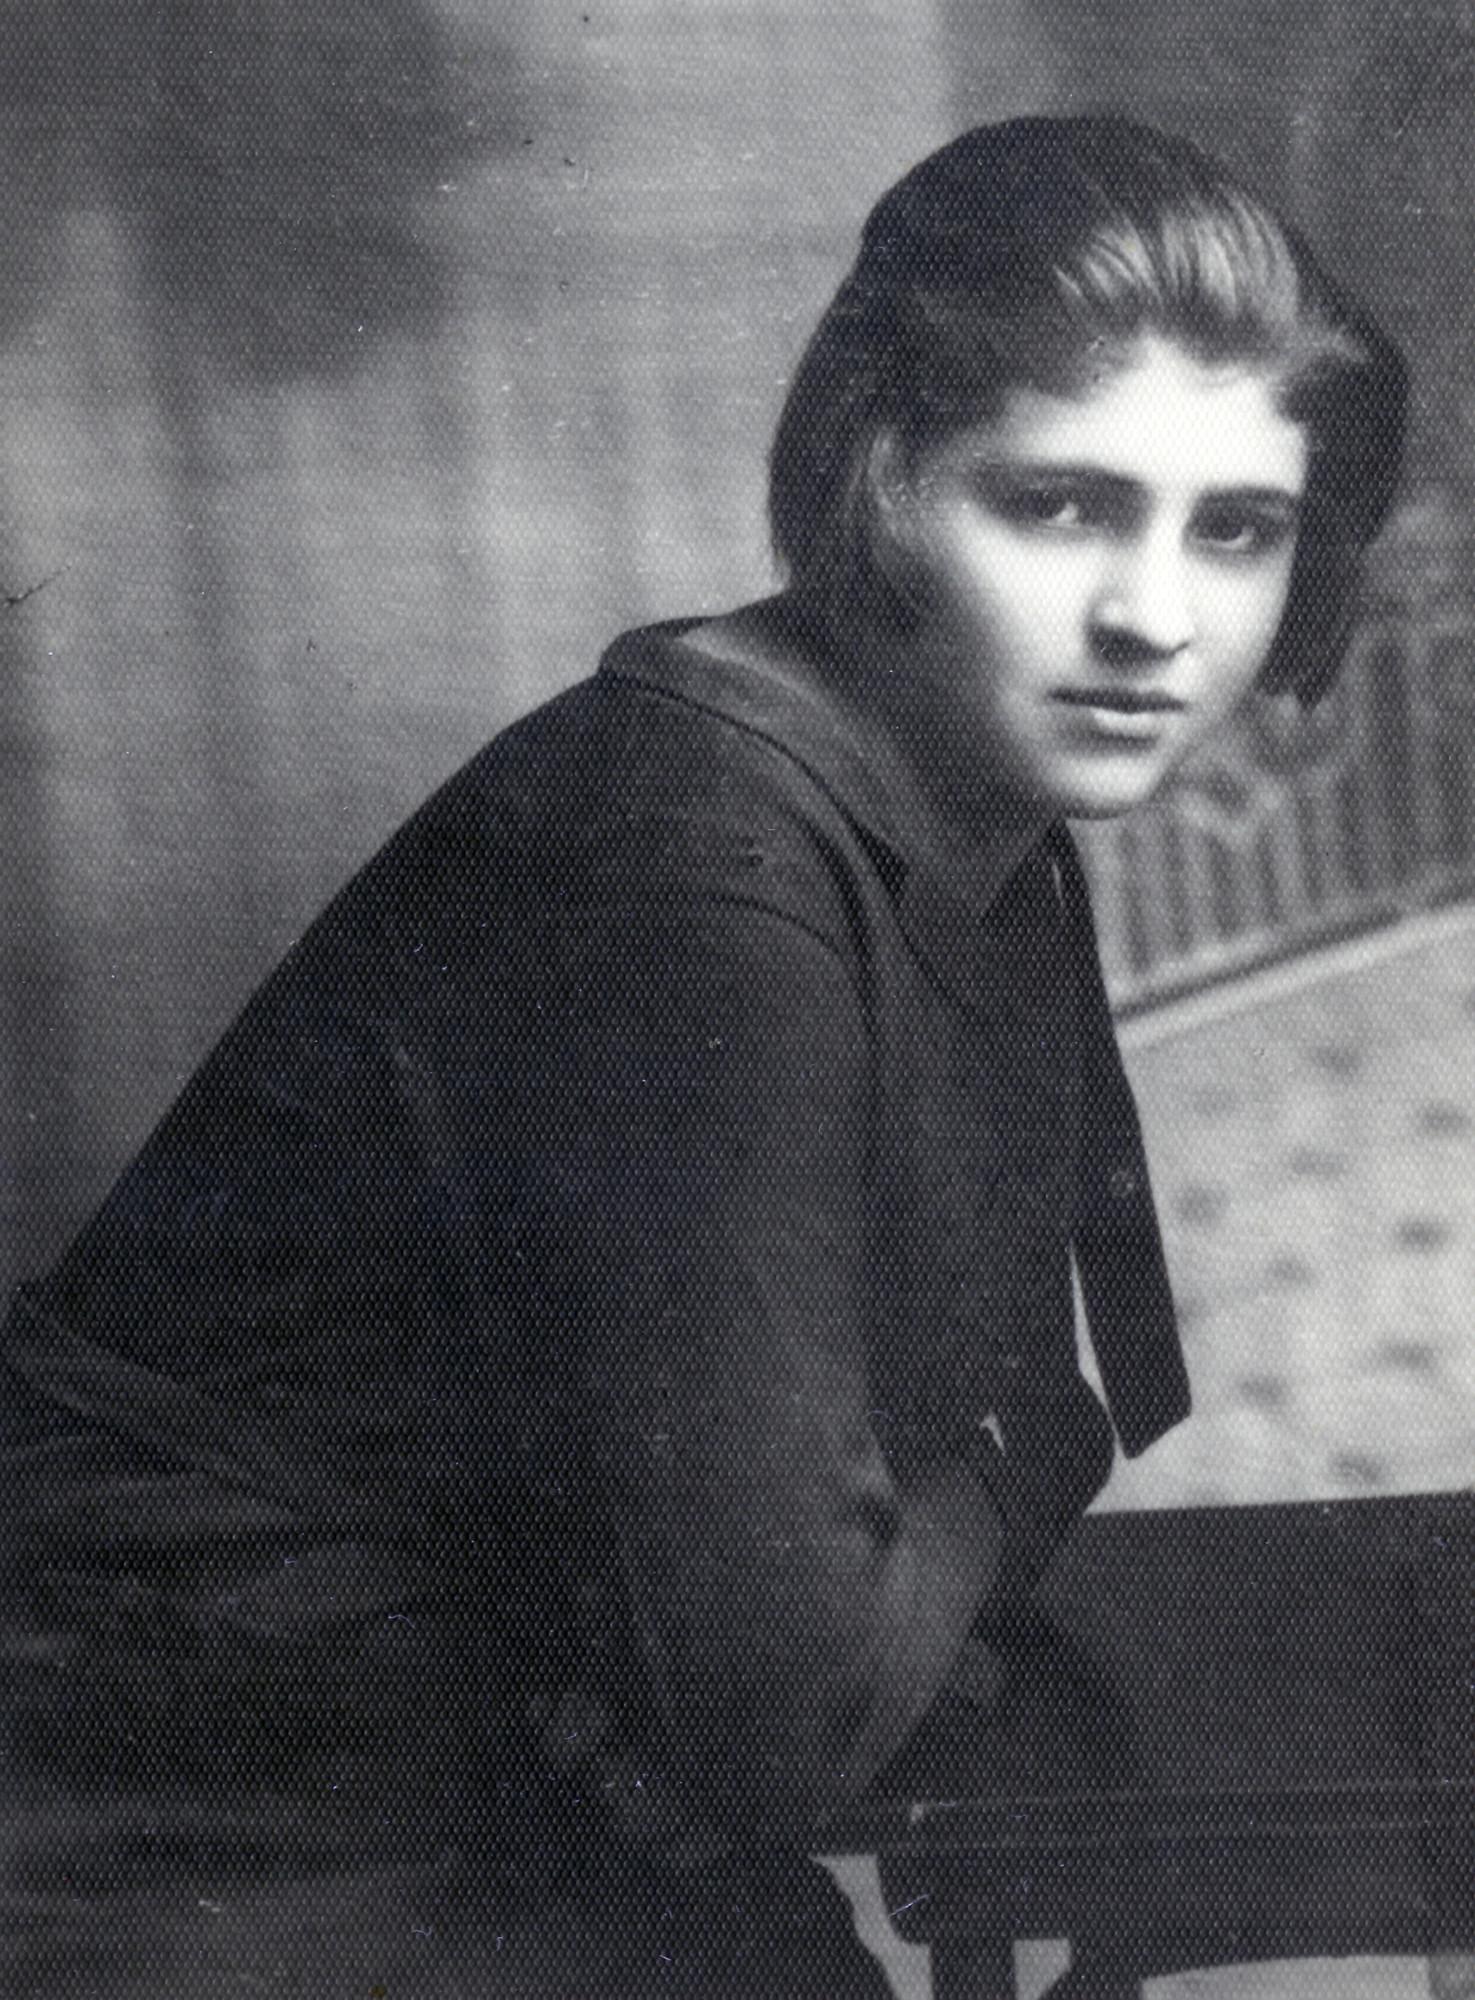 Portrait of Luba (Lipka) Danishevski.  Luba perished in Auschwitz with her three-year-old son.